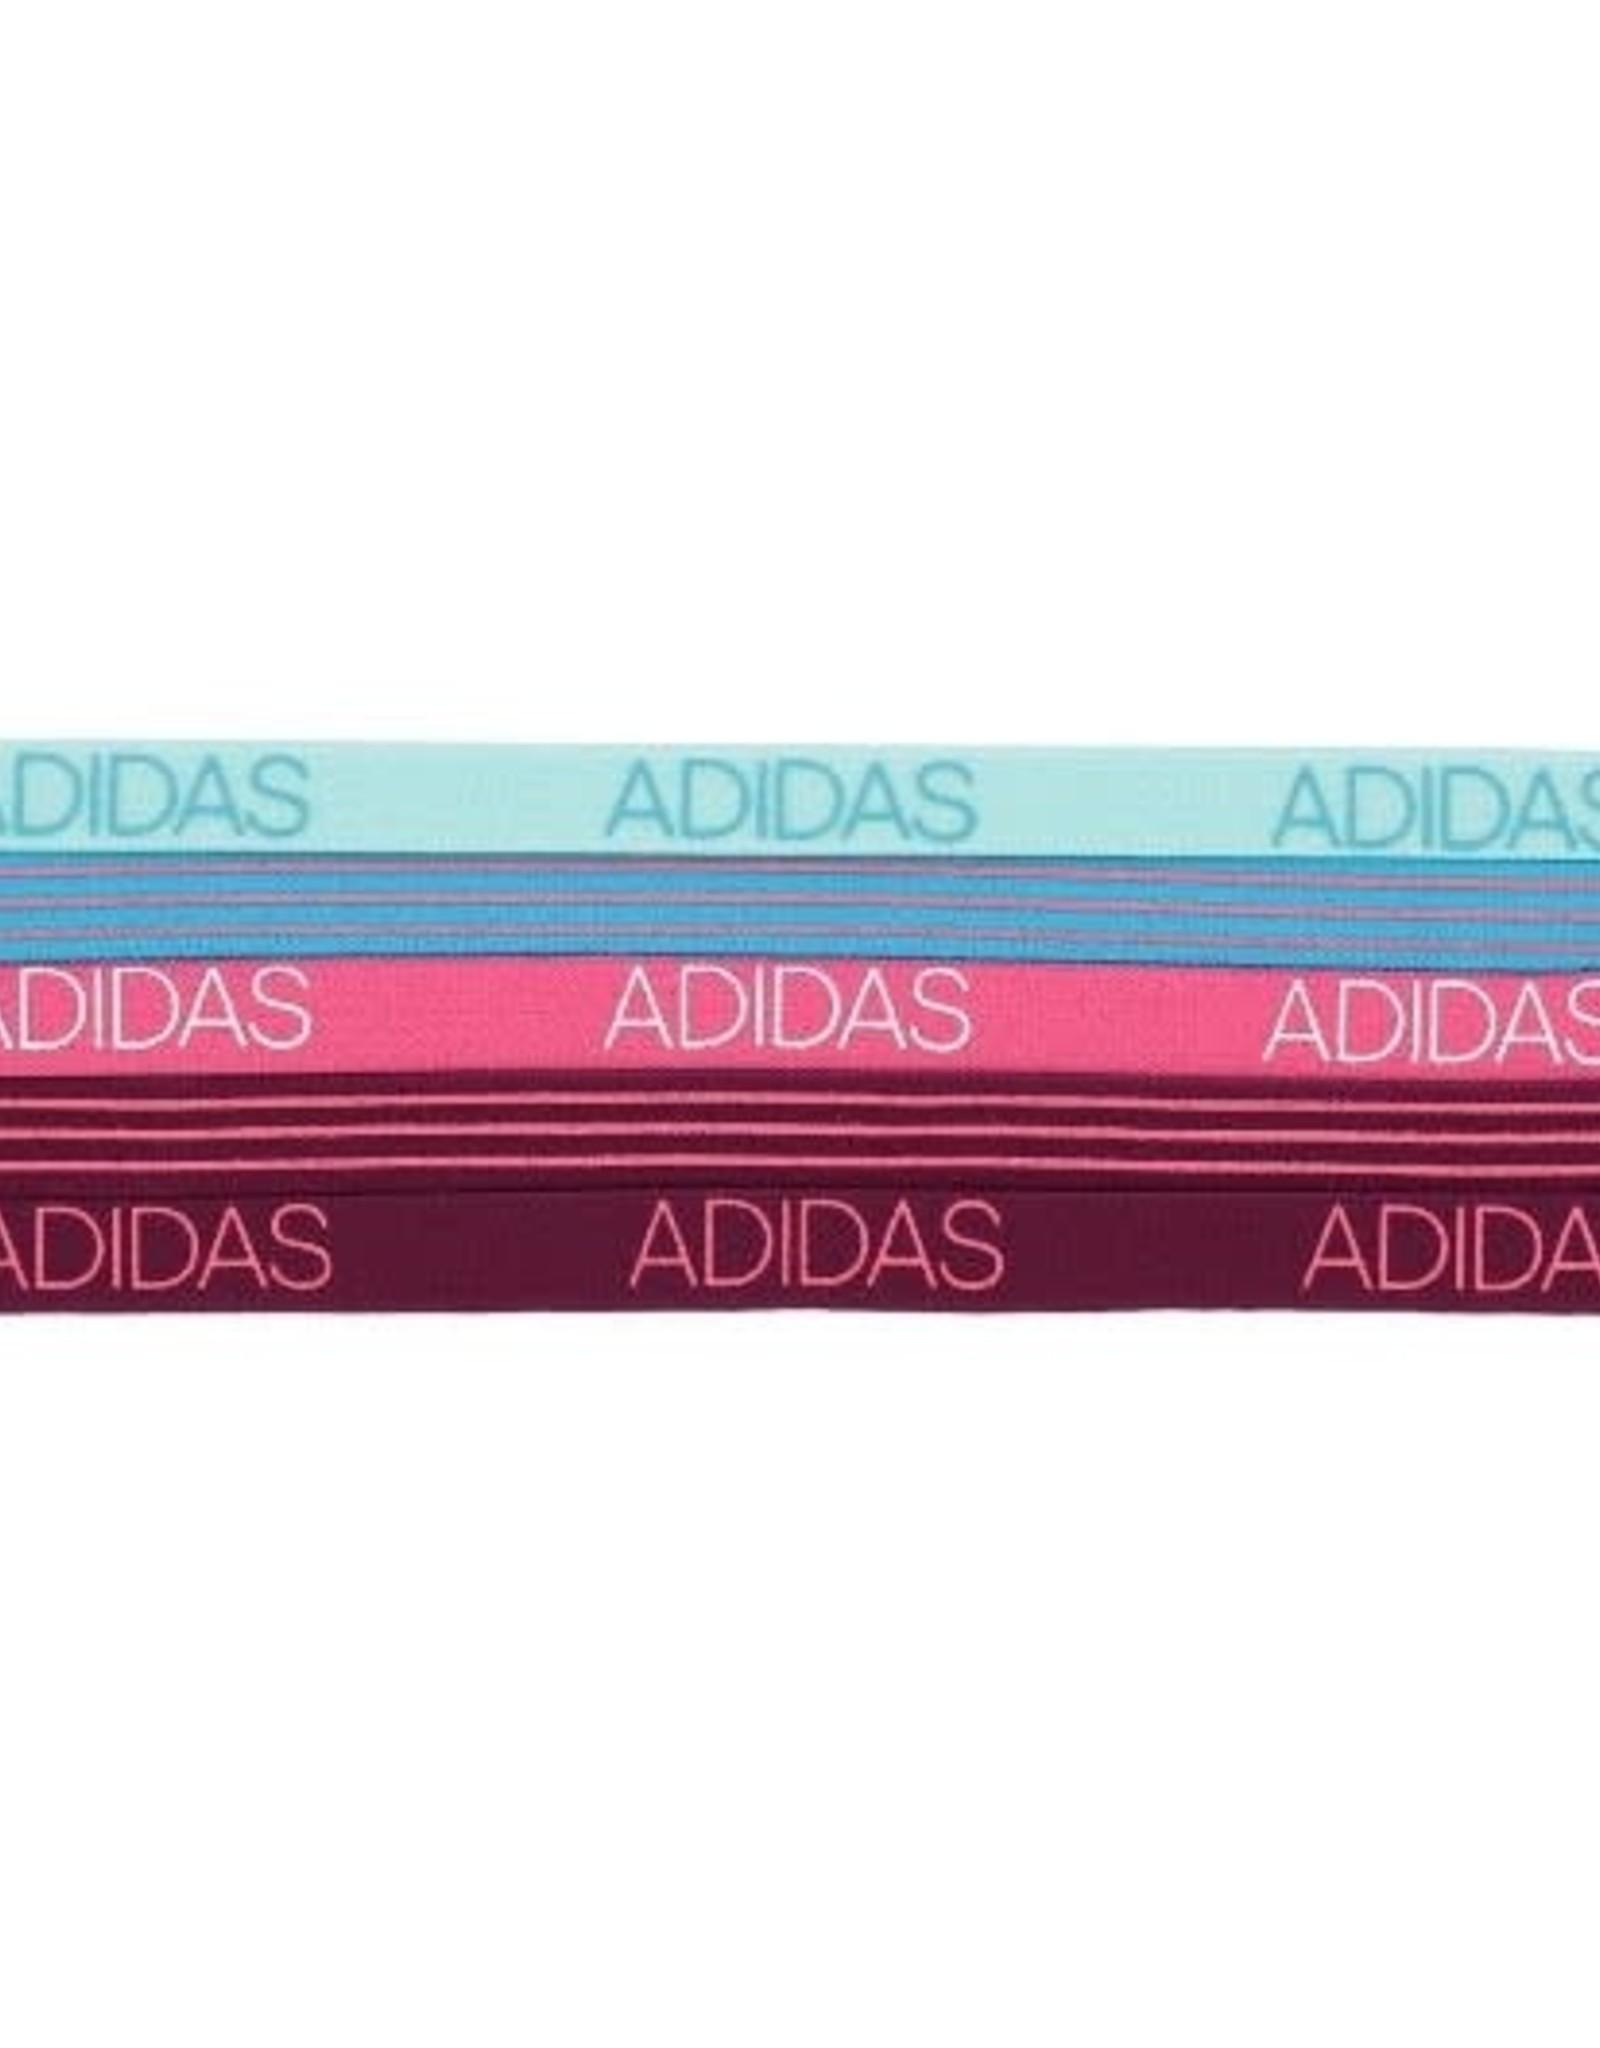 Adidas Adidas Creator Hairbands 5142716